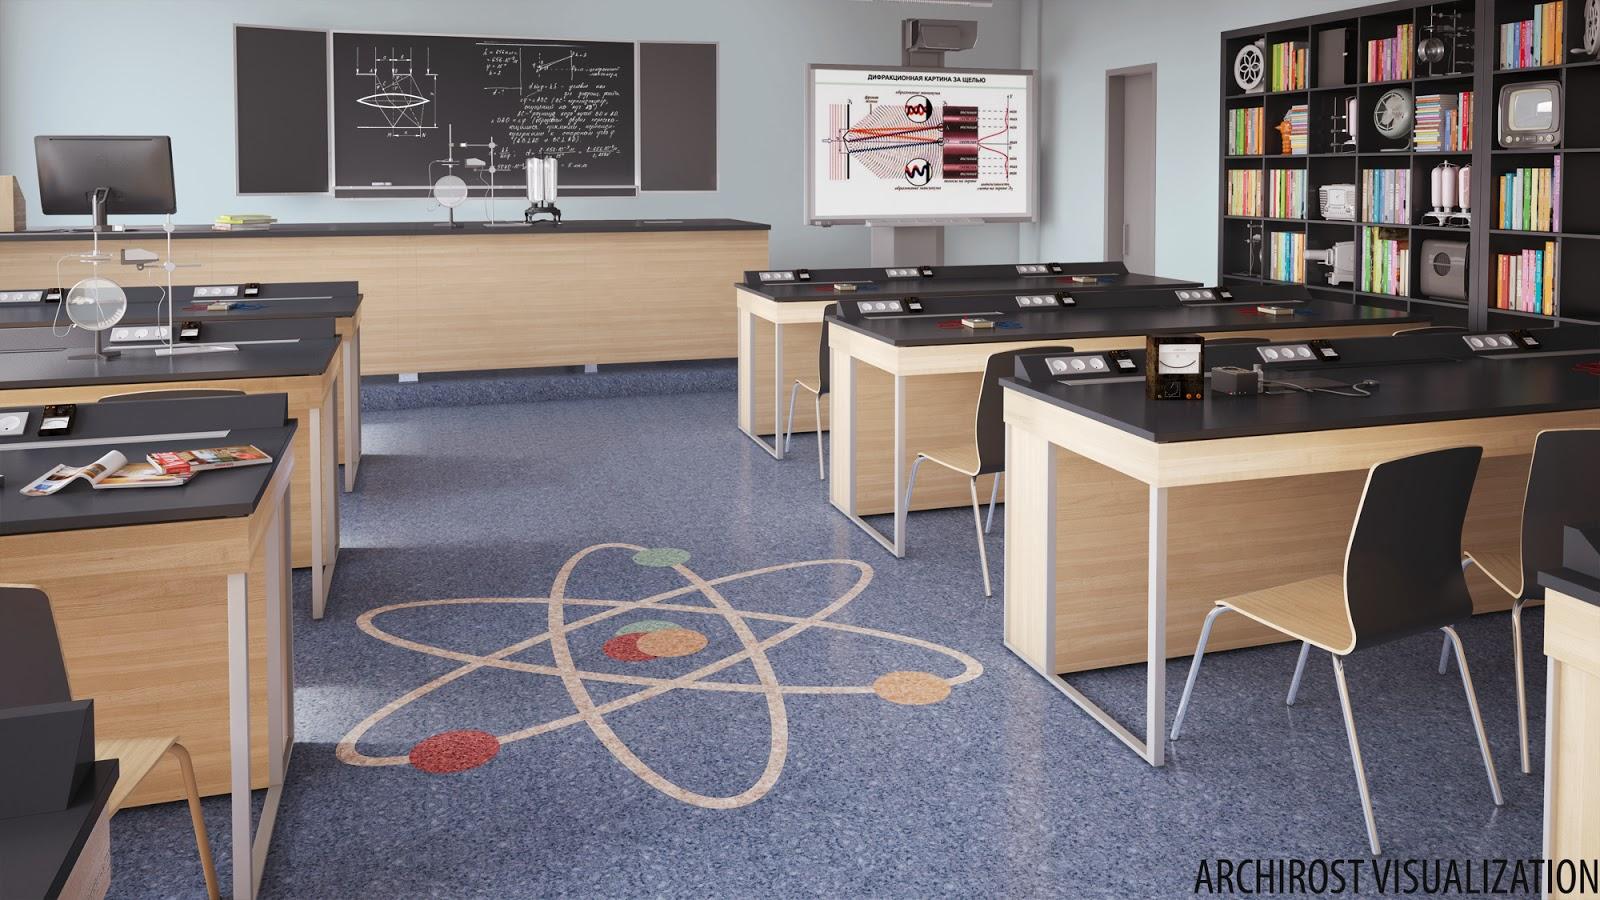 Дизайн кабинета физики в школе фото